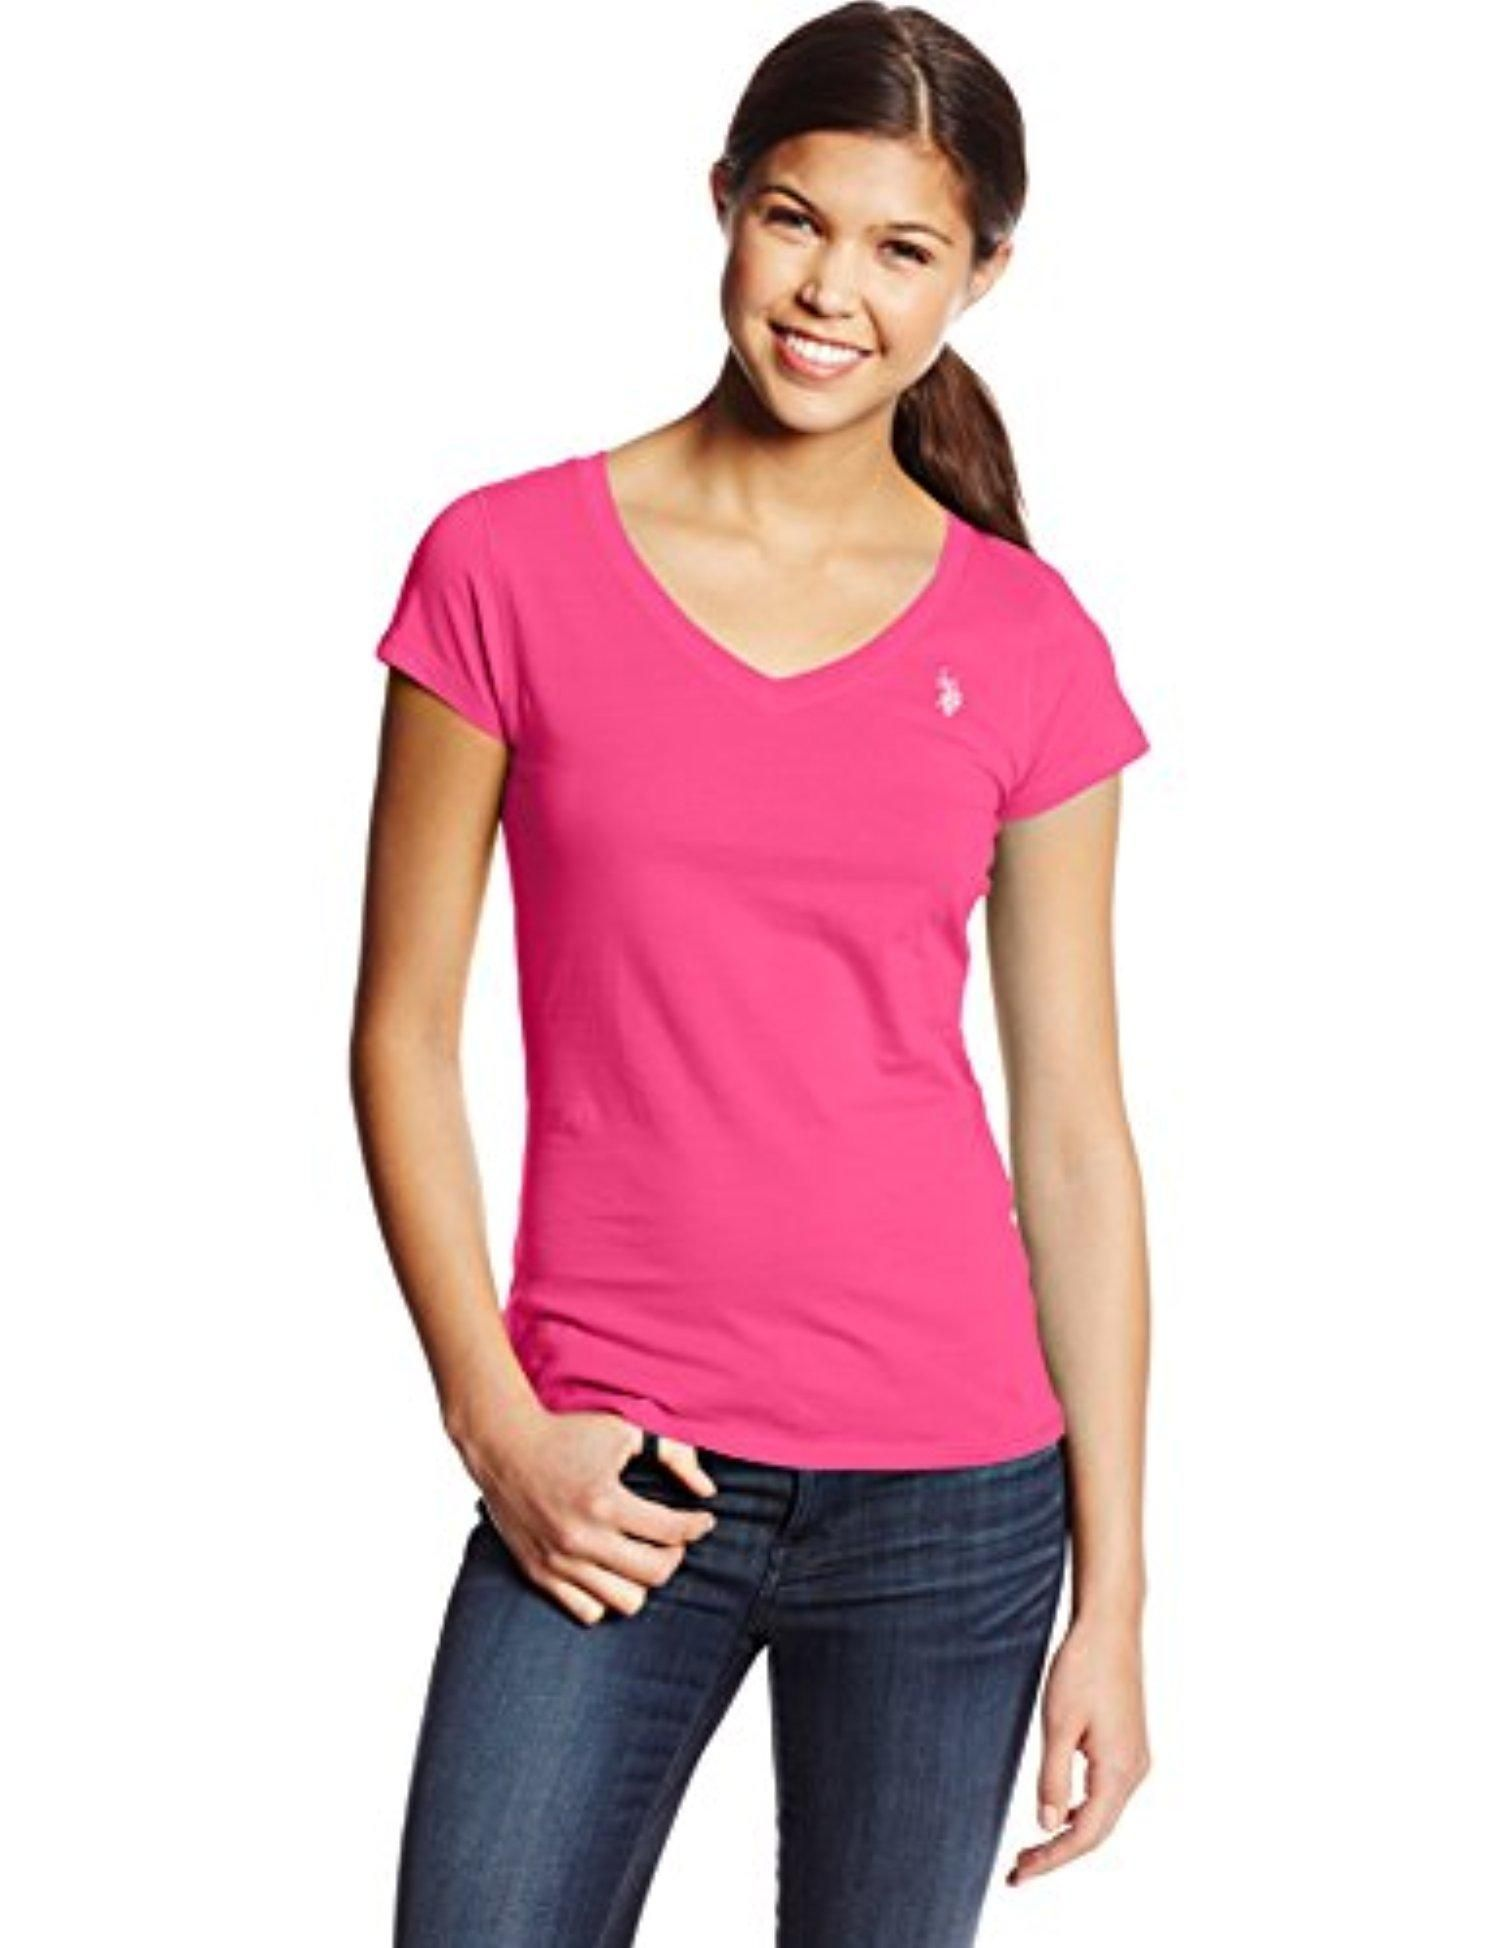 U.S. Polo Assn. Junior's Short Sleeve V-Neck T-Shirt, Pink Paradise, Medium